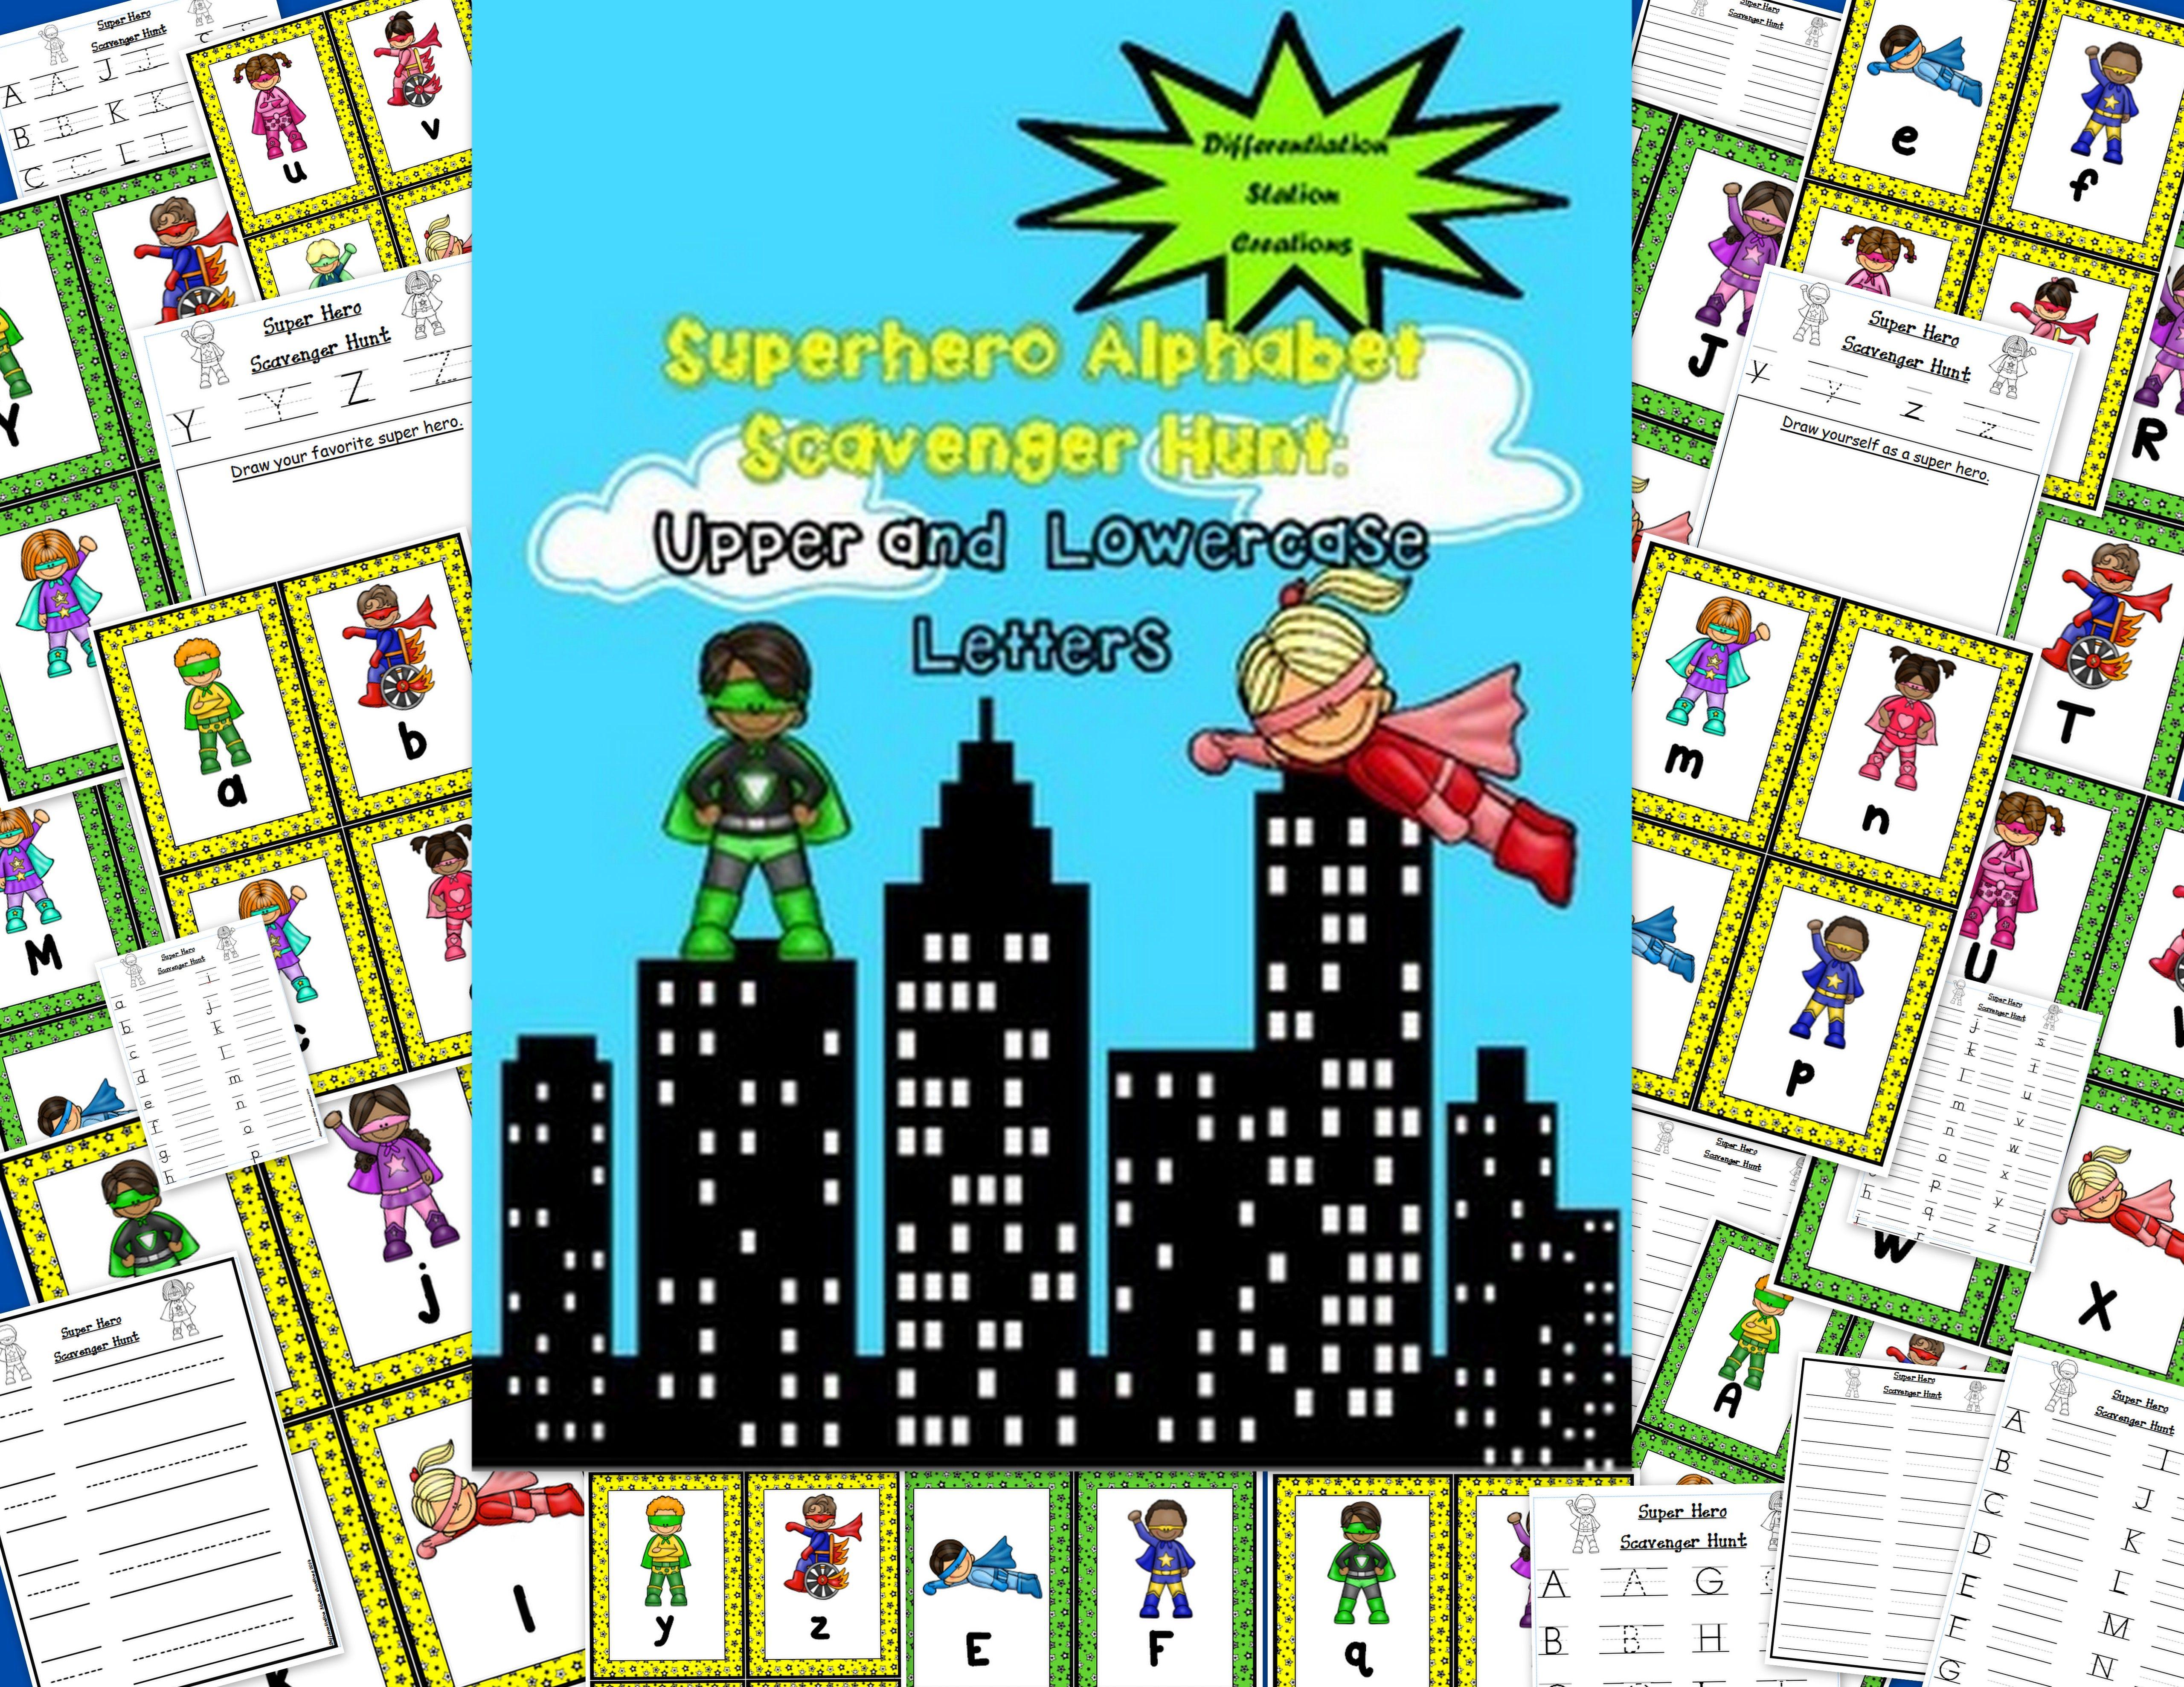 Super Hero Alphabet Scavenger Hunt